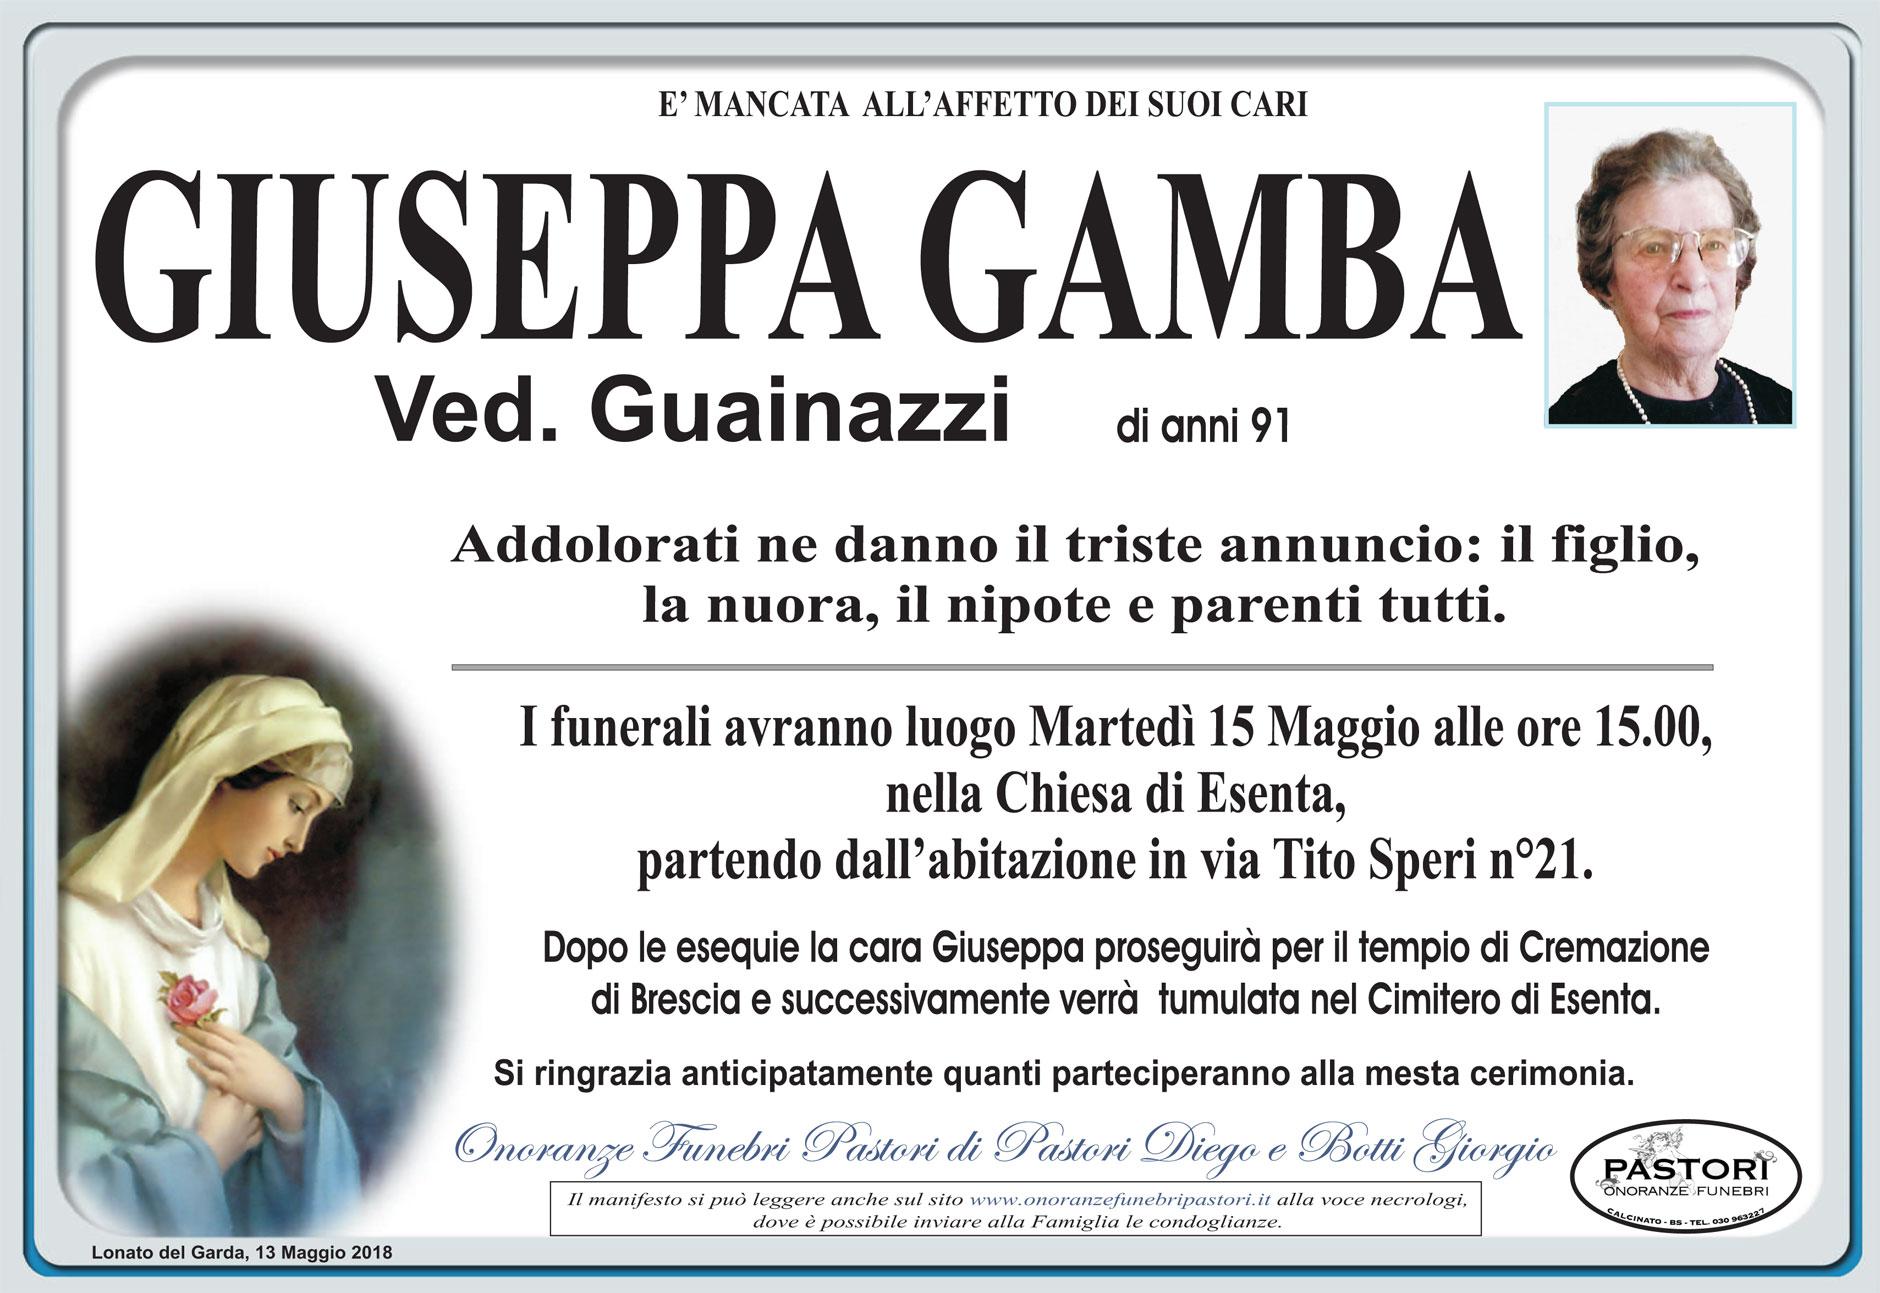 Giuseppa Gamba